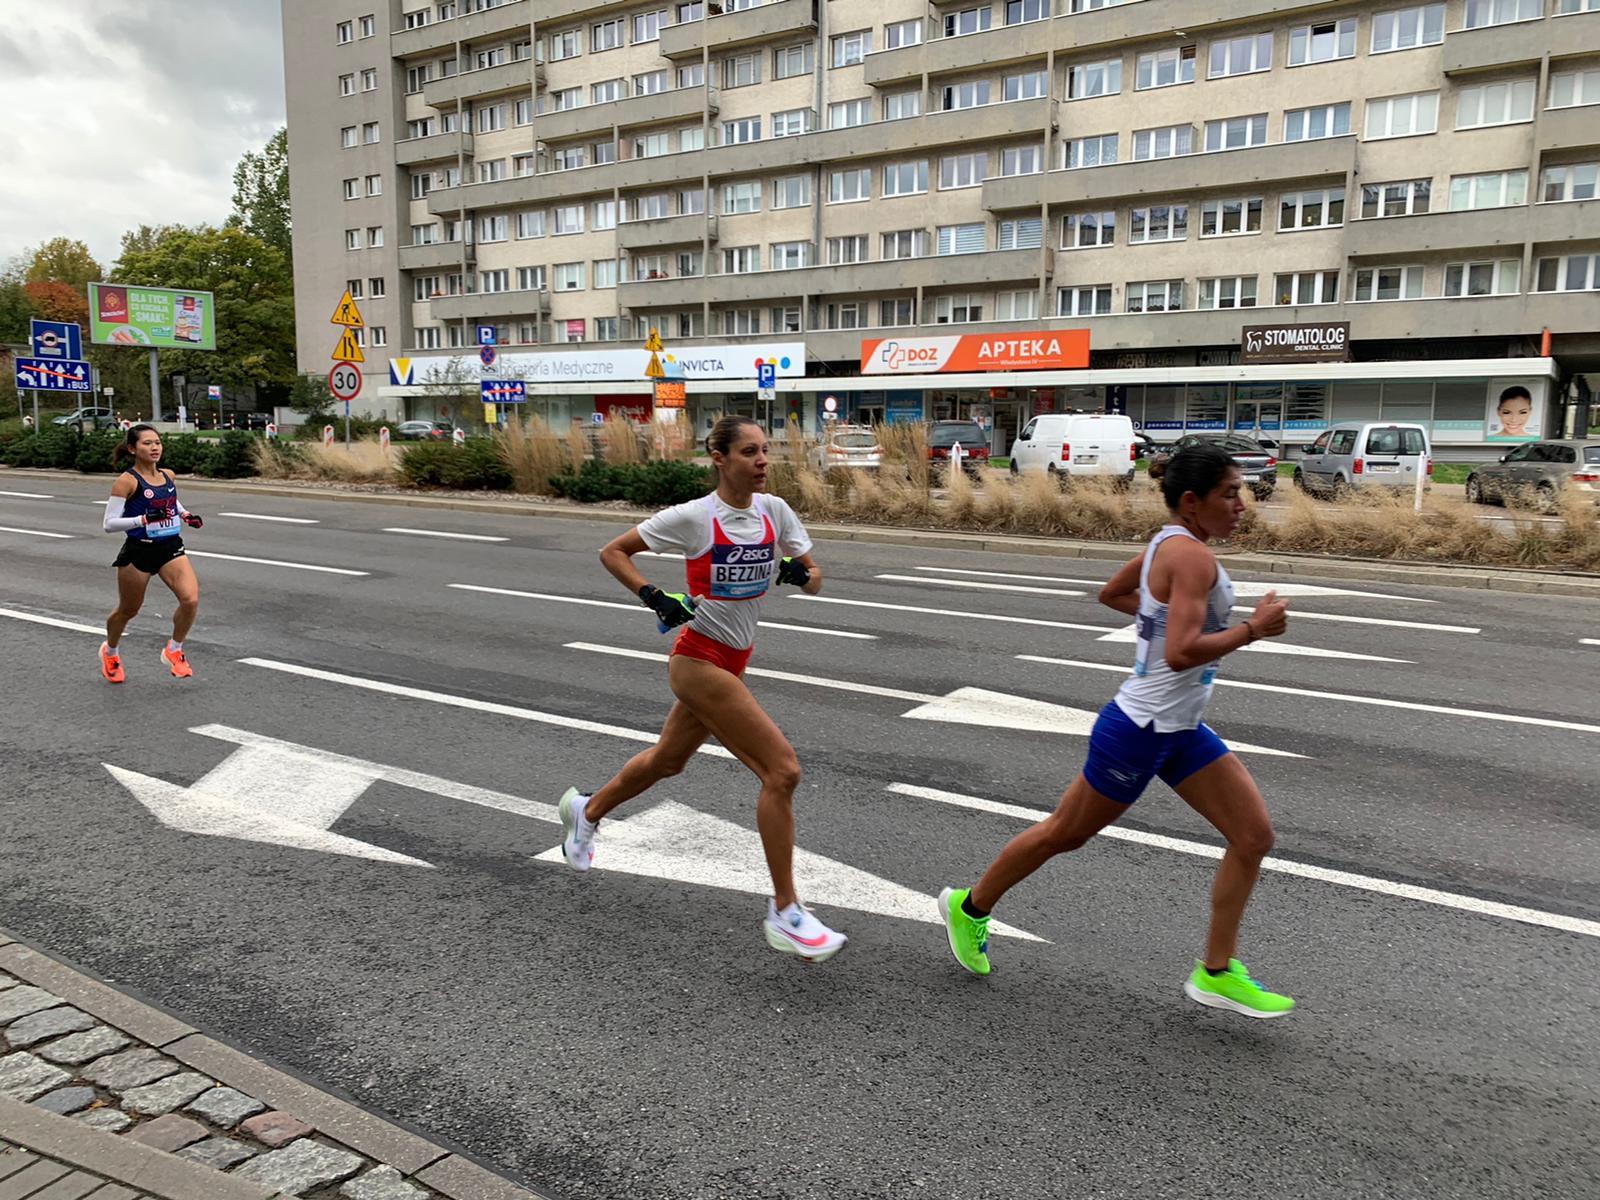 Strong performances by Maltese athletes in World Half Marathon Championships